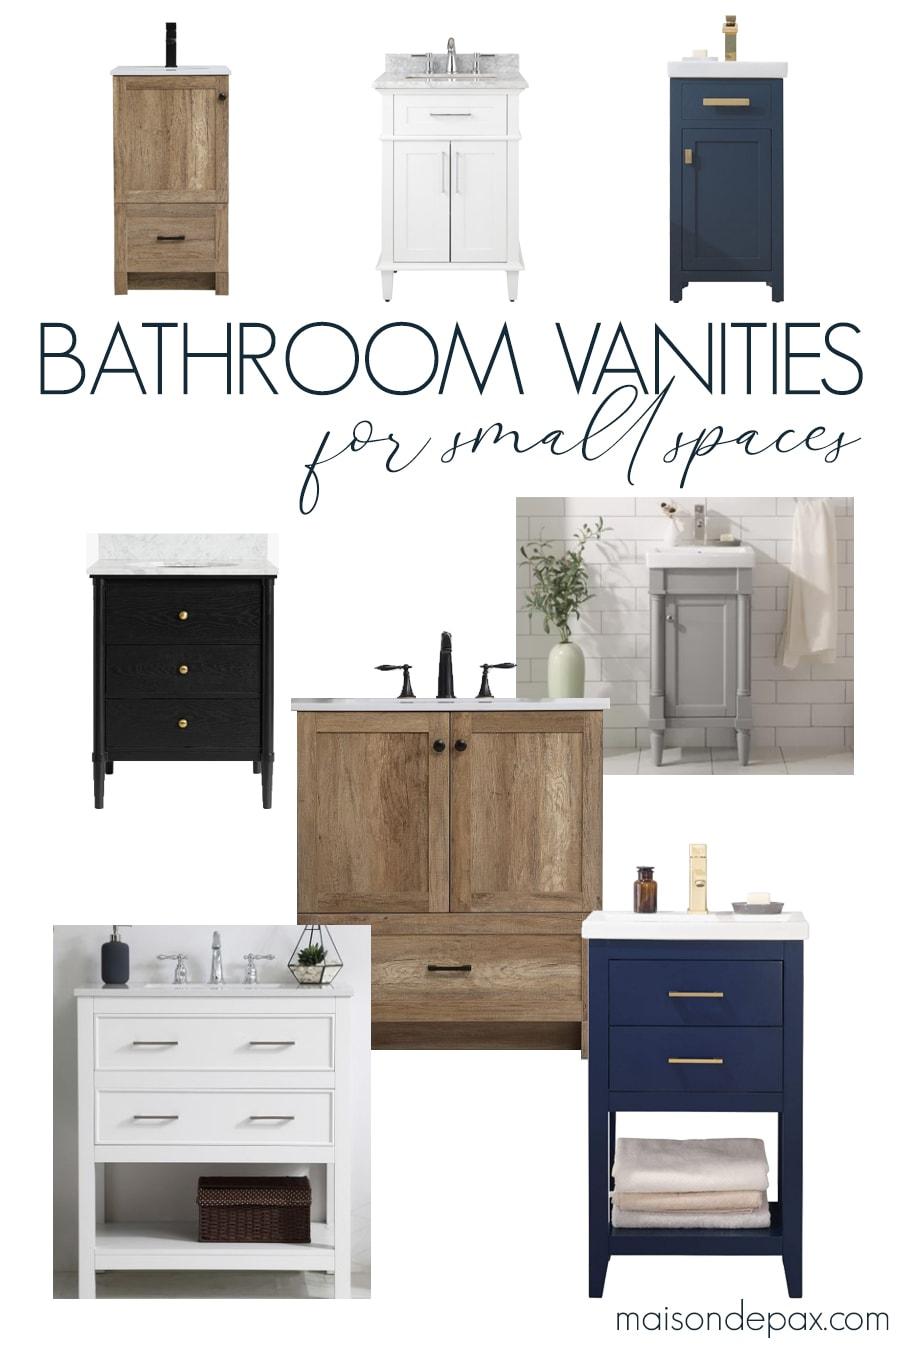 bathroom vanities for small spaces | Maison de Pax